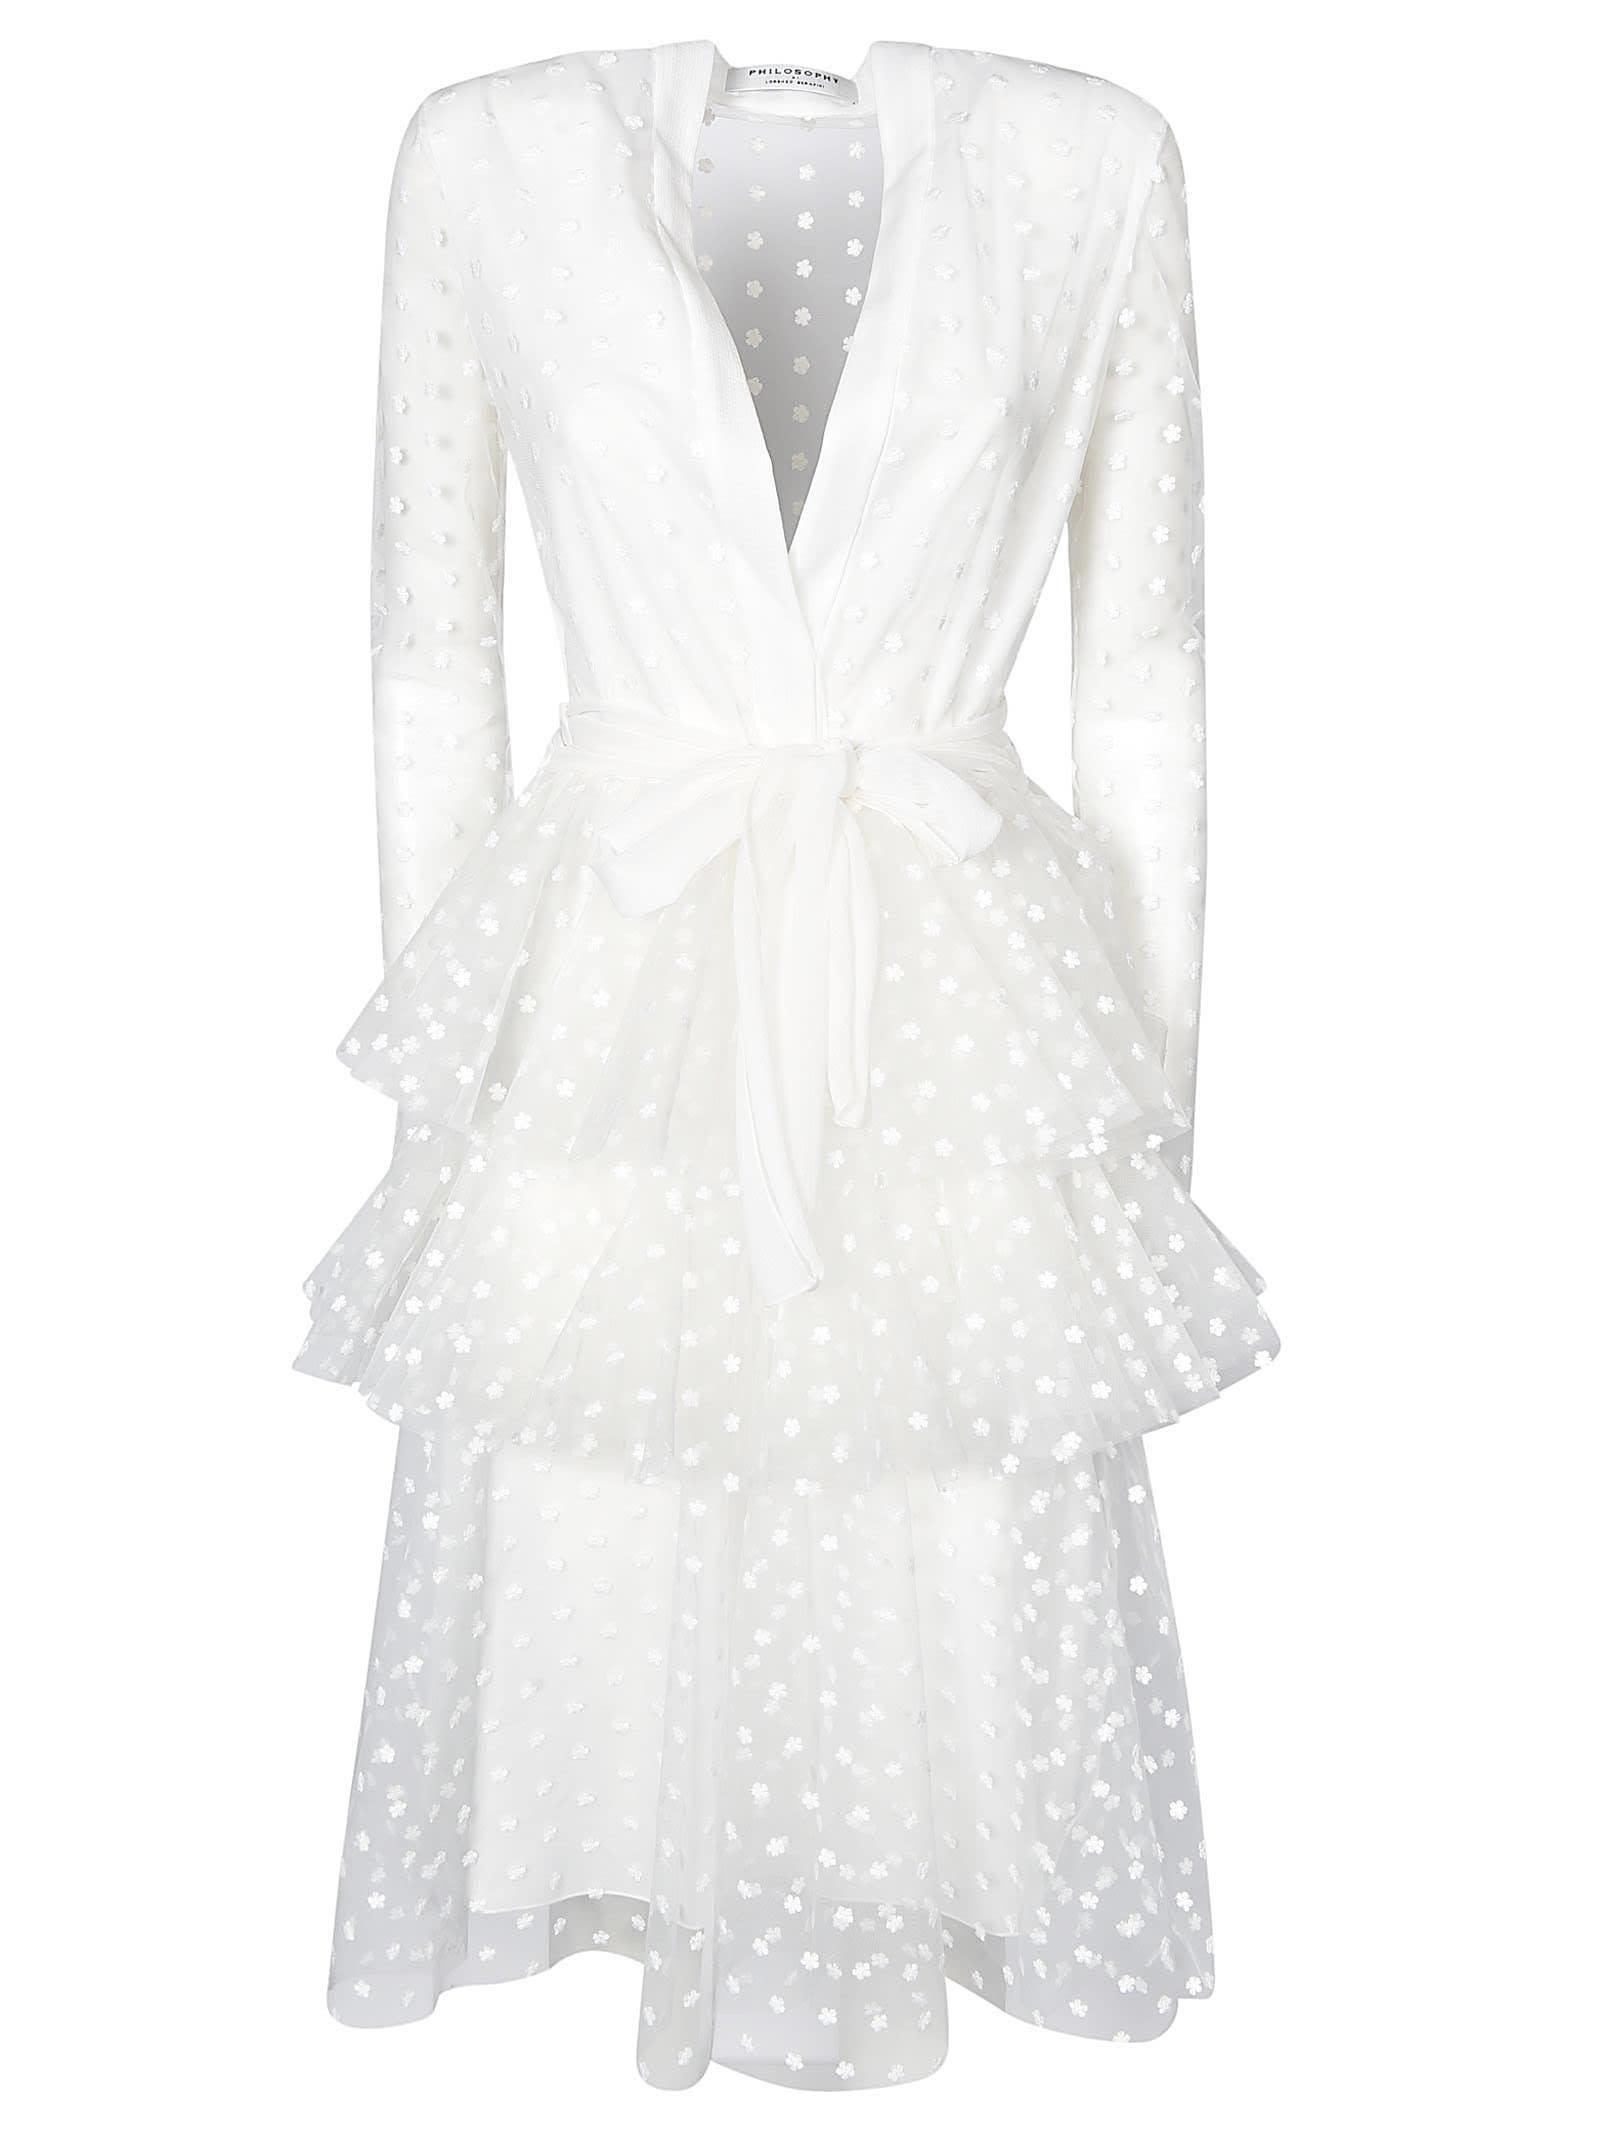 Buy Philosophy di Lorenzo Serafini V-neck Dotted Motif Dress online, shop Philosophy di Lorenzo Serafini with free shipping